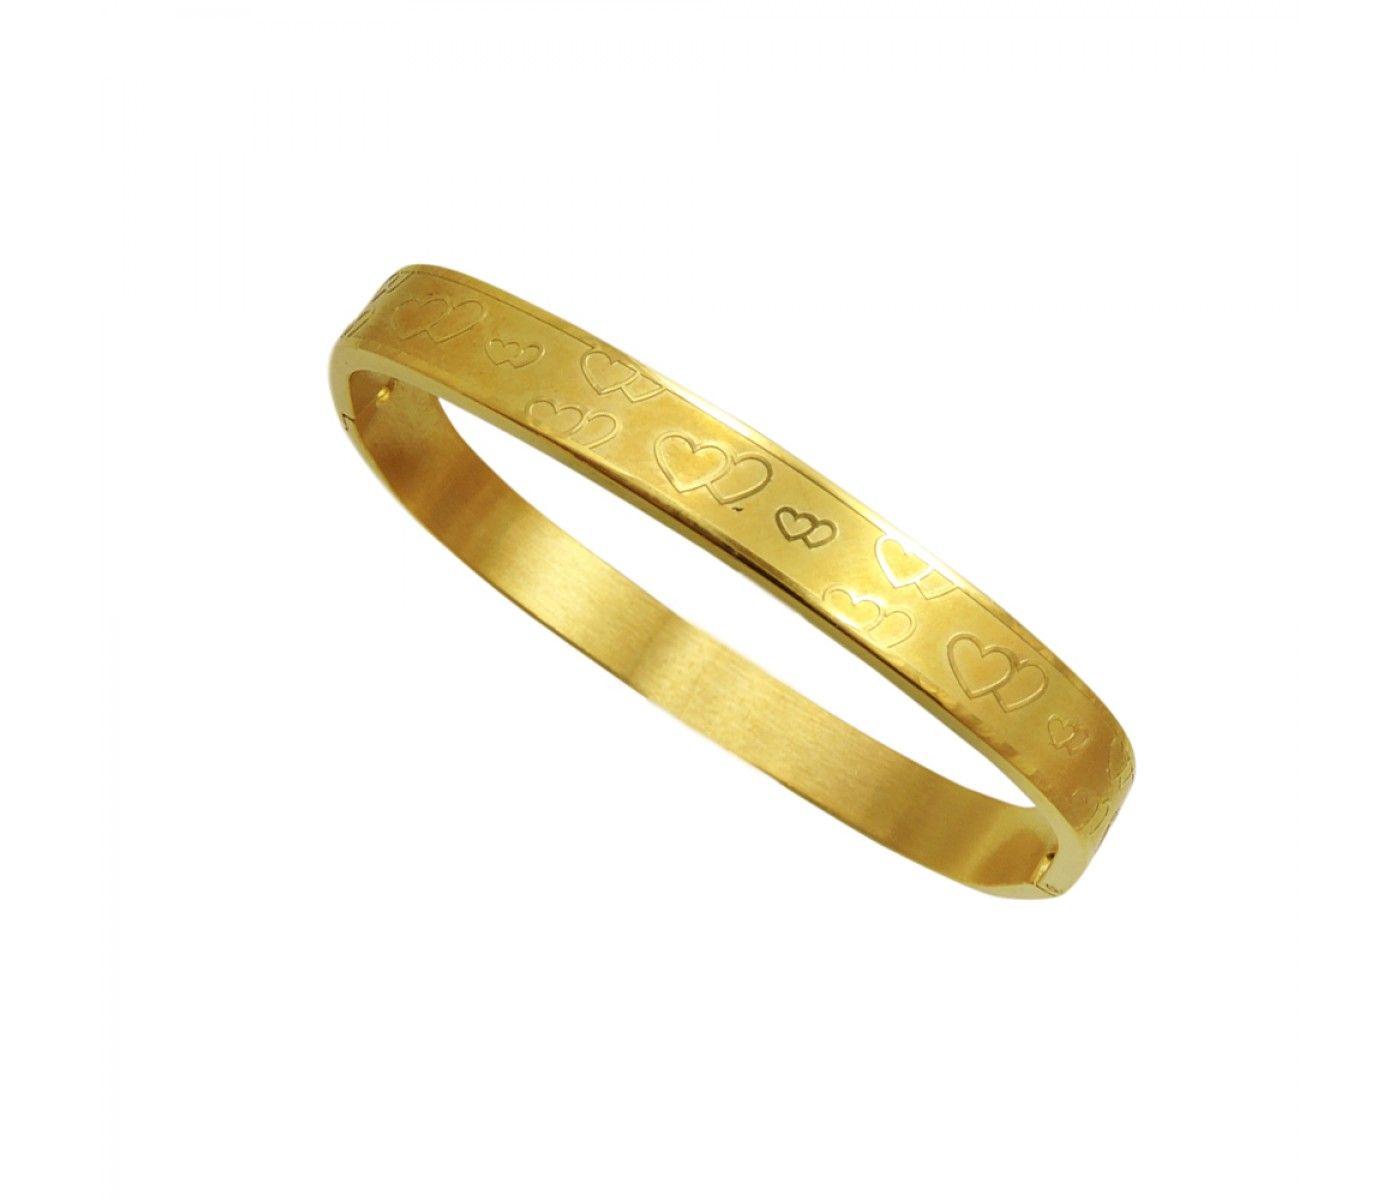 Mens Kada Gold Kada For Mens Gold Kada Design For Man Gold Kada